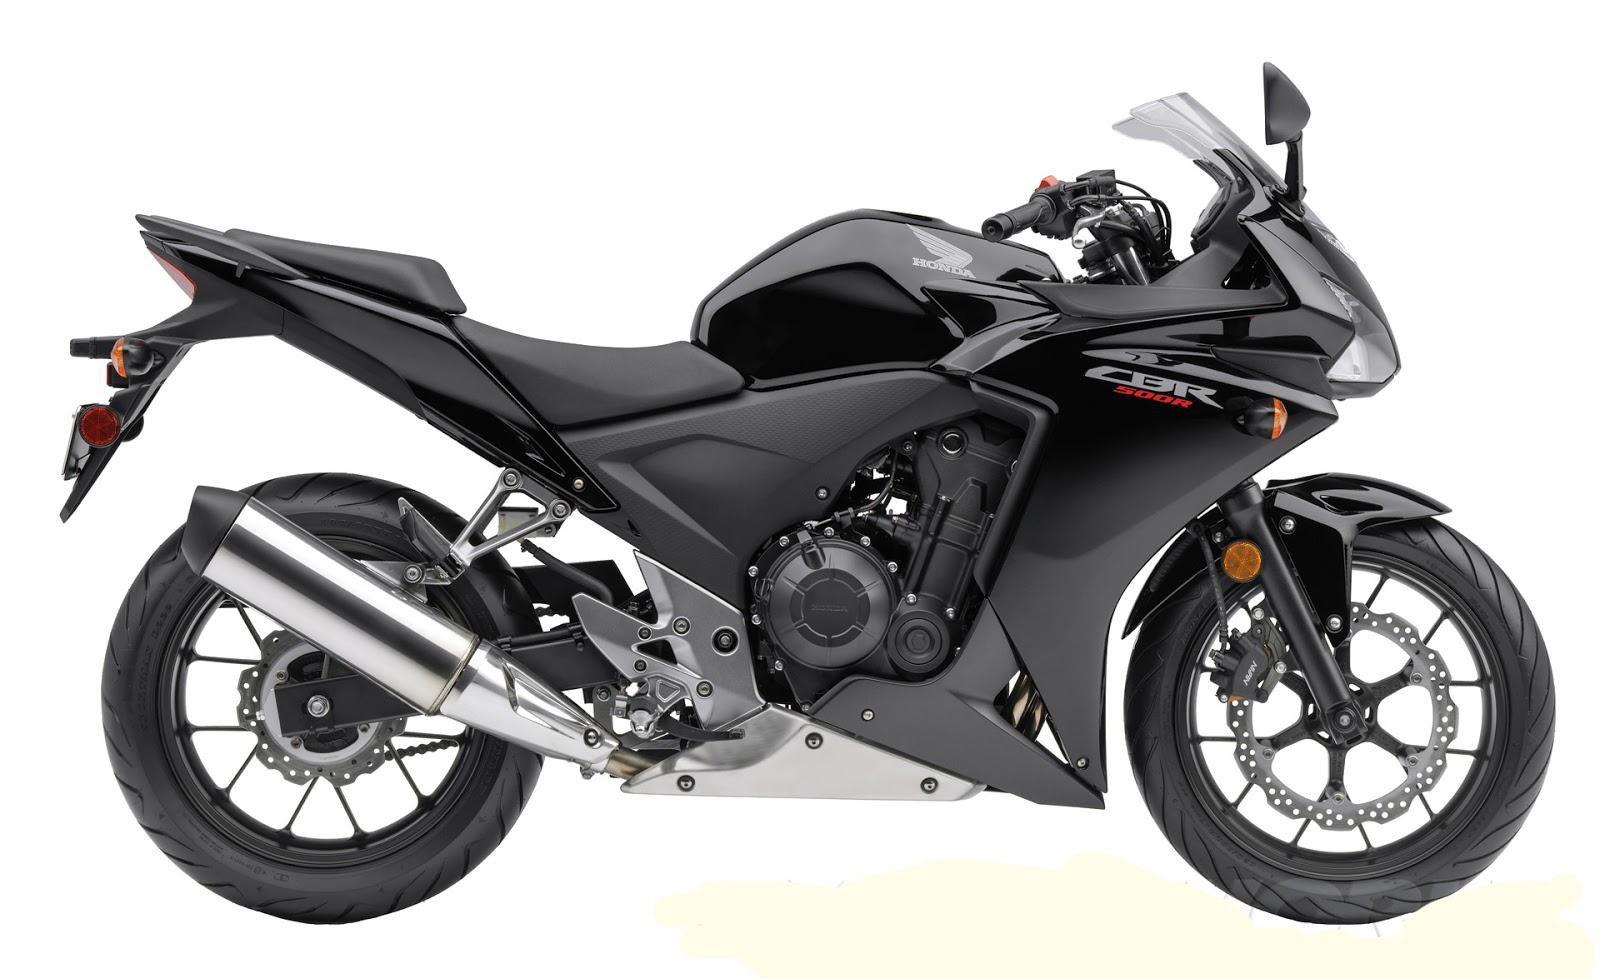 2013 honda cbr500r motorcycle. Black Bedroom Furniture Sets. Home Design Ideas